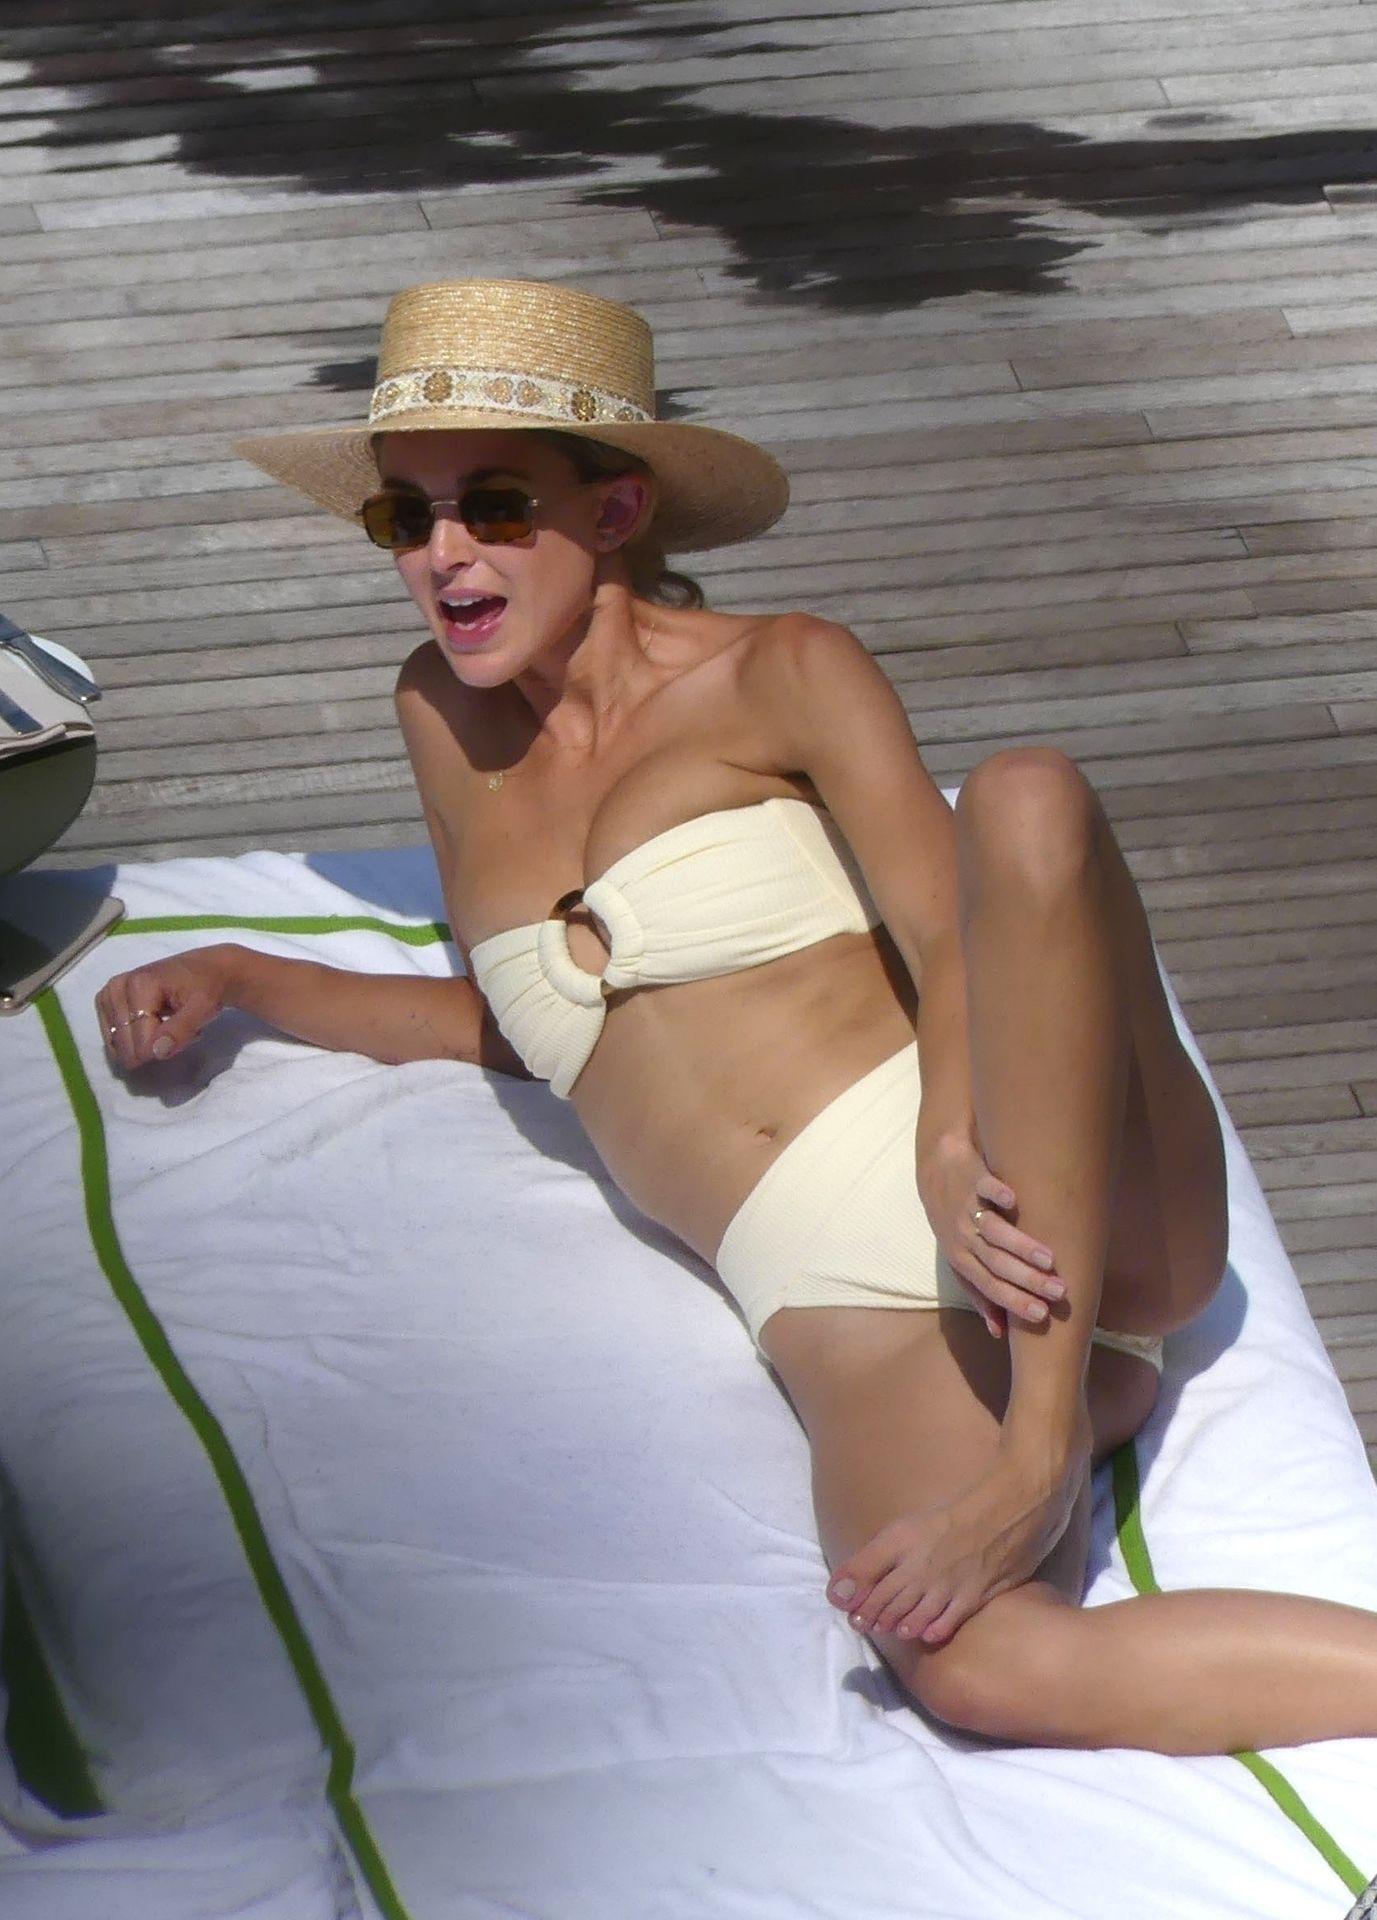 0713004446900_54_Miley-Cyrus-Topless-Kaitlynn-Carter-Hot-TheFappeningBlog.com-54.jpg